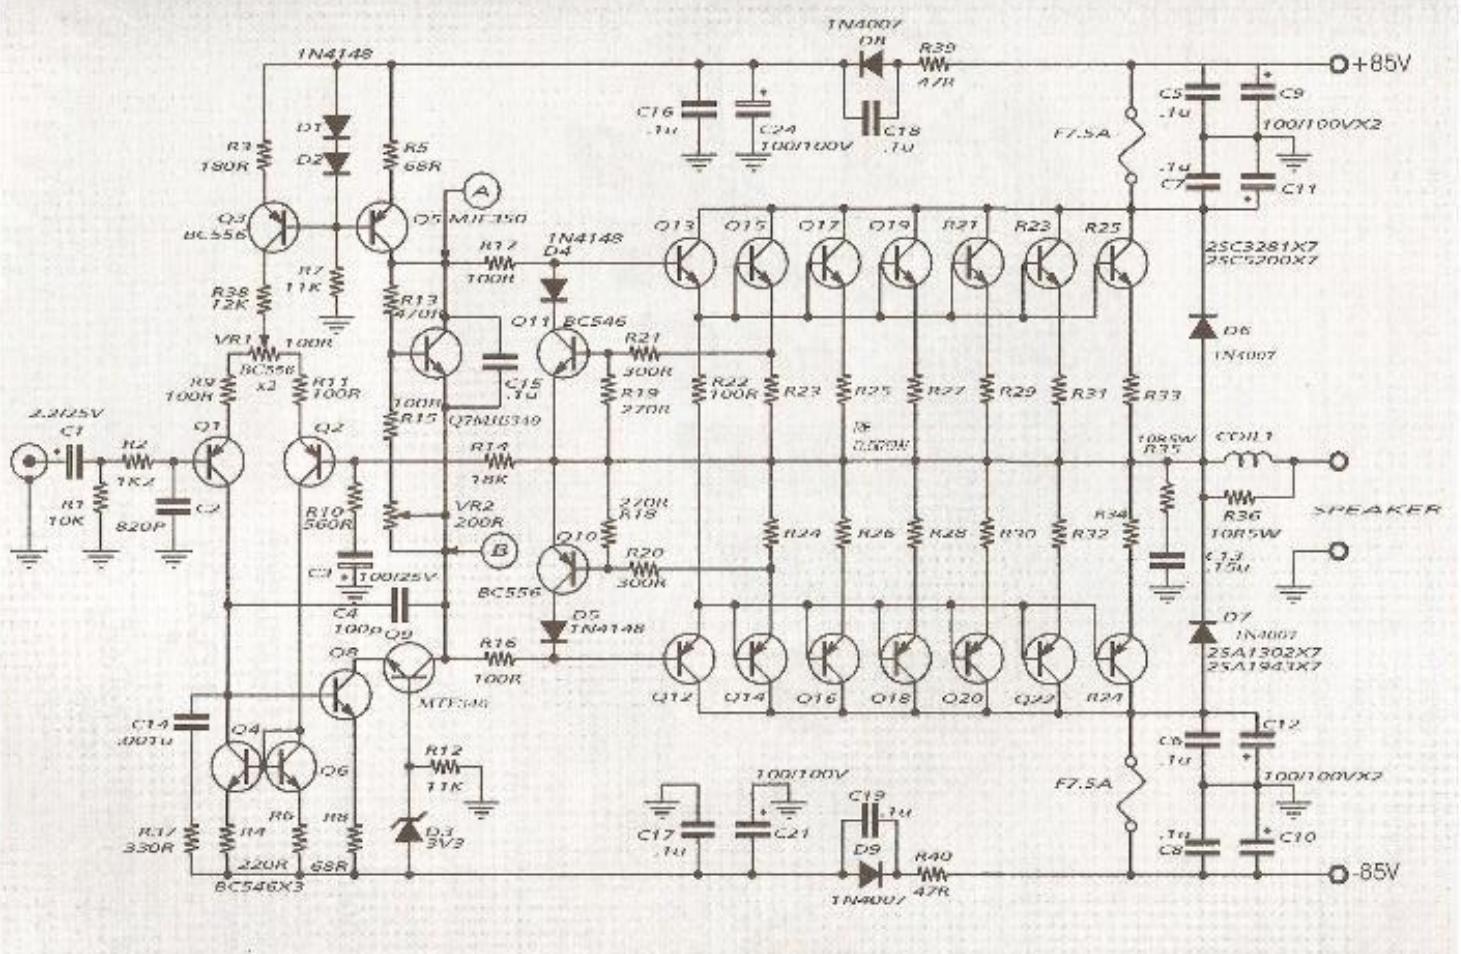 small resolution of yamaha amp schematic wiring diagram list mix yamaha amp schematic advance wiring diagram yamaha jx20 amp